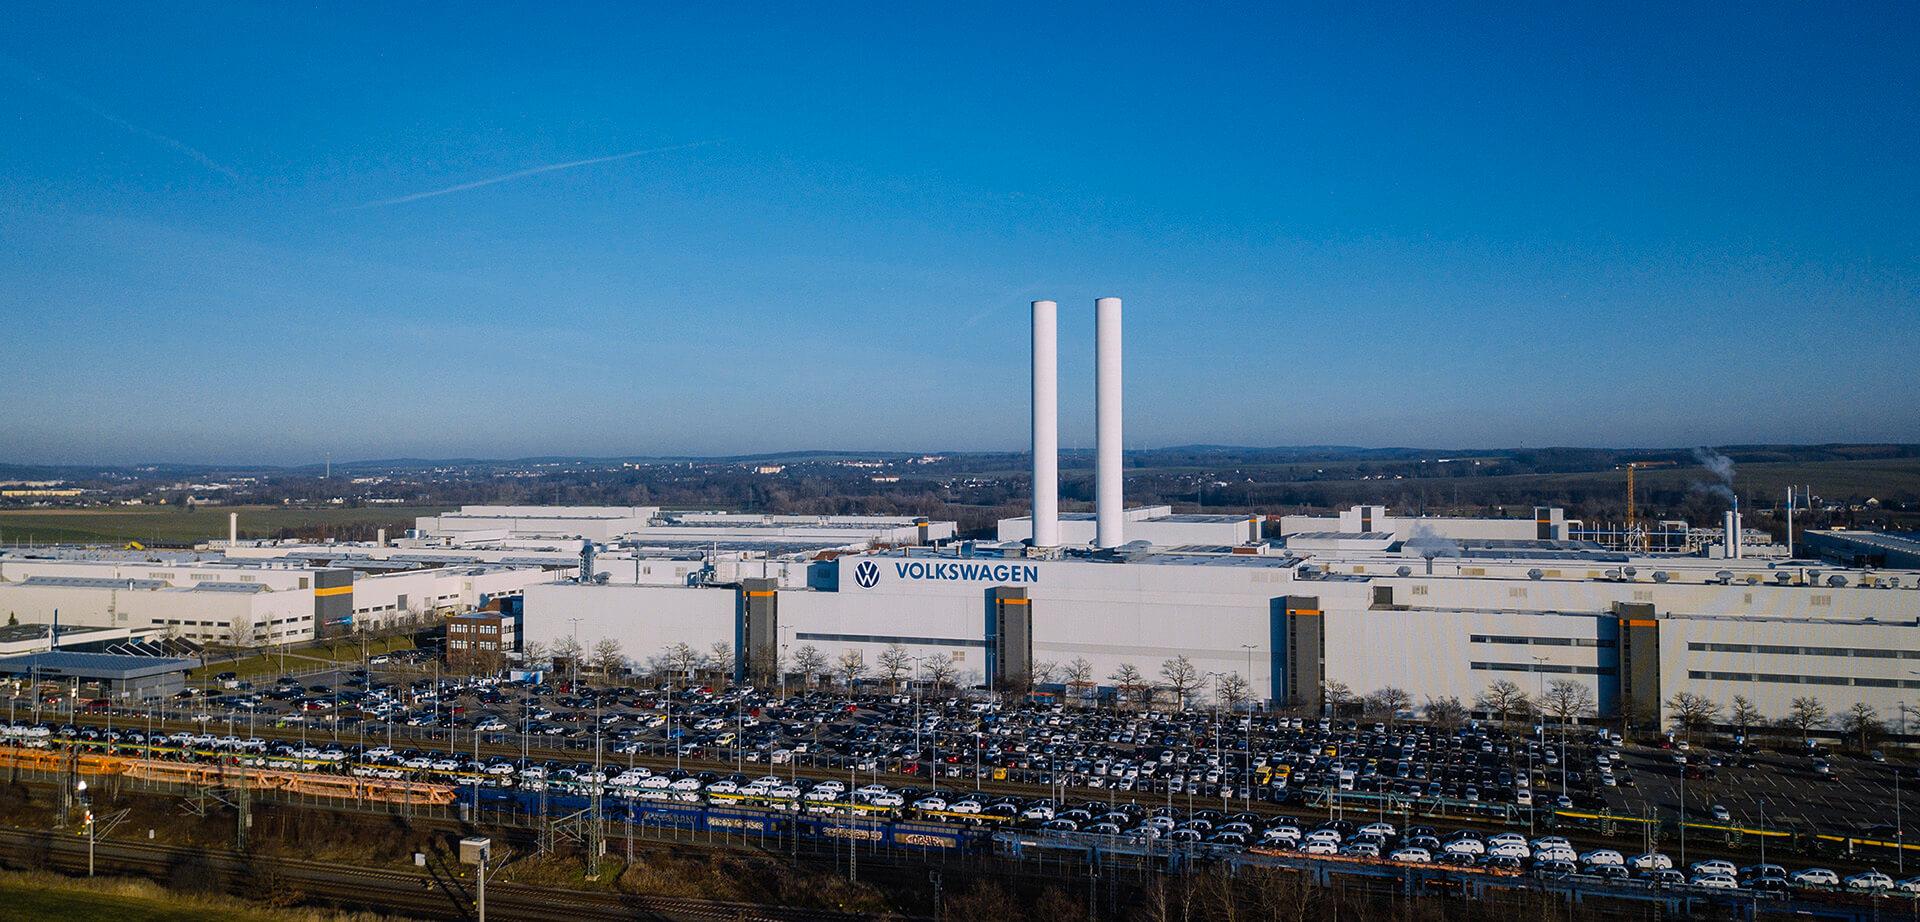 Volkswagen Εργοστάσιο Zwickau